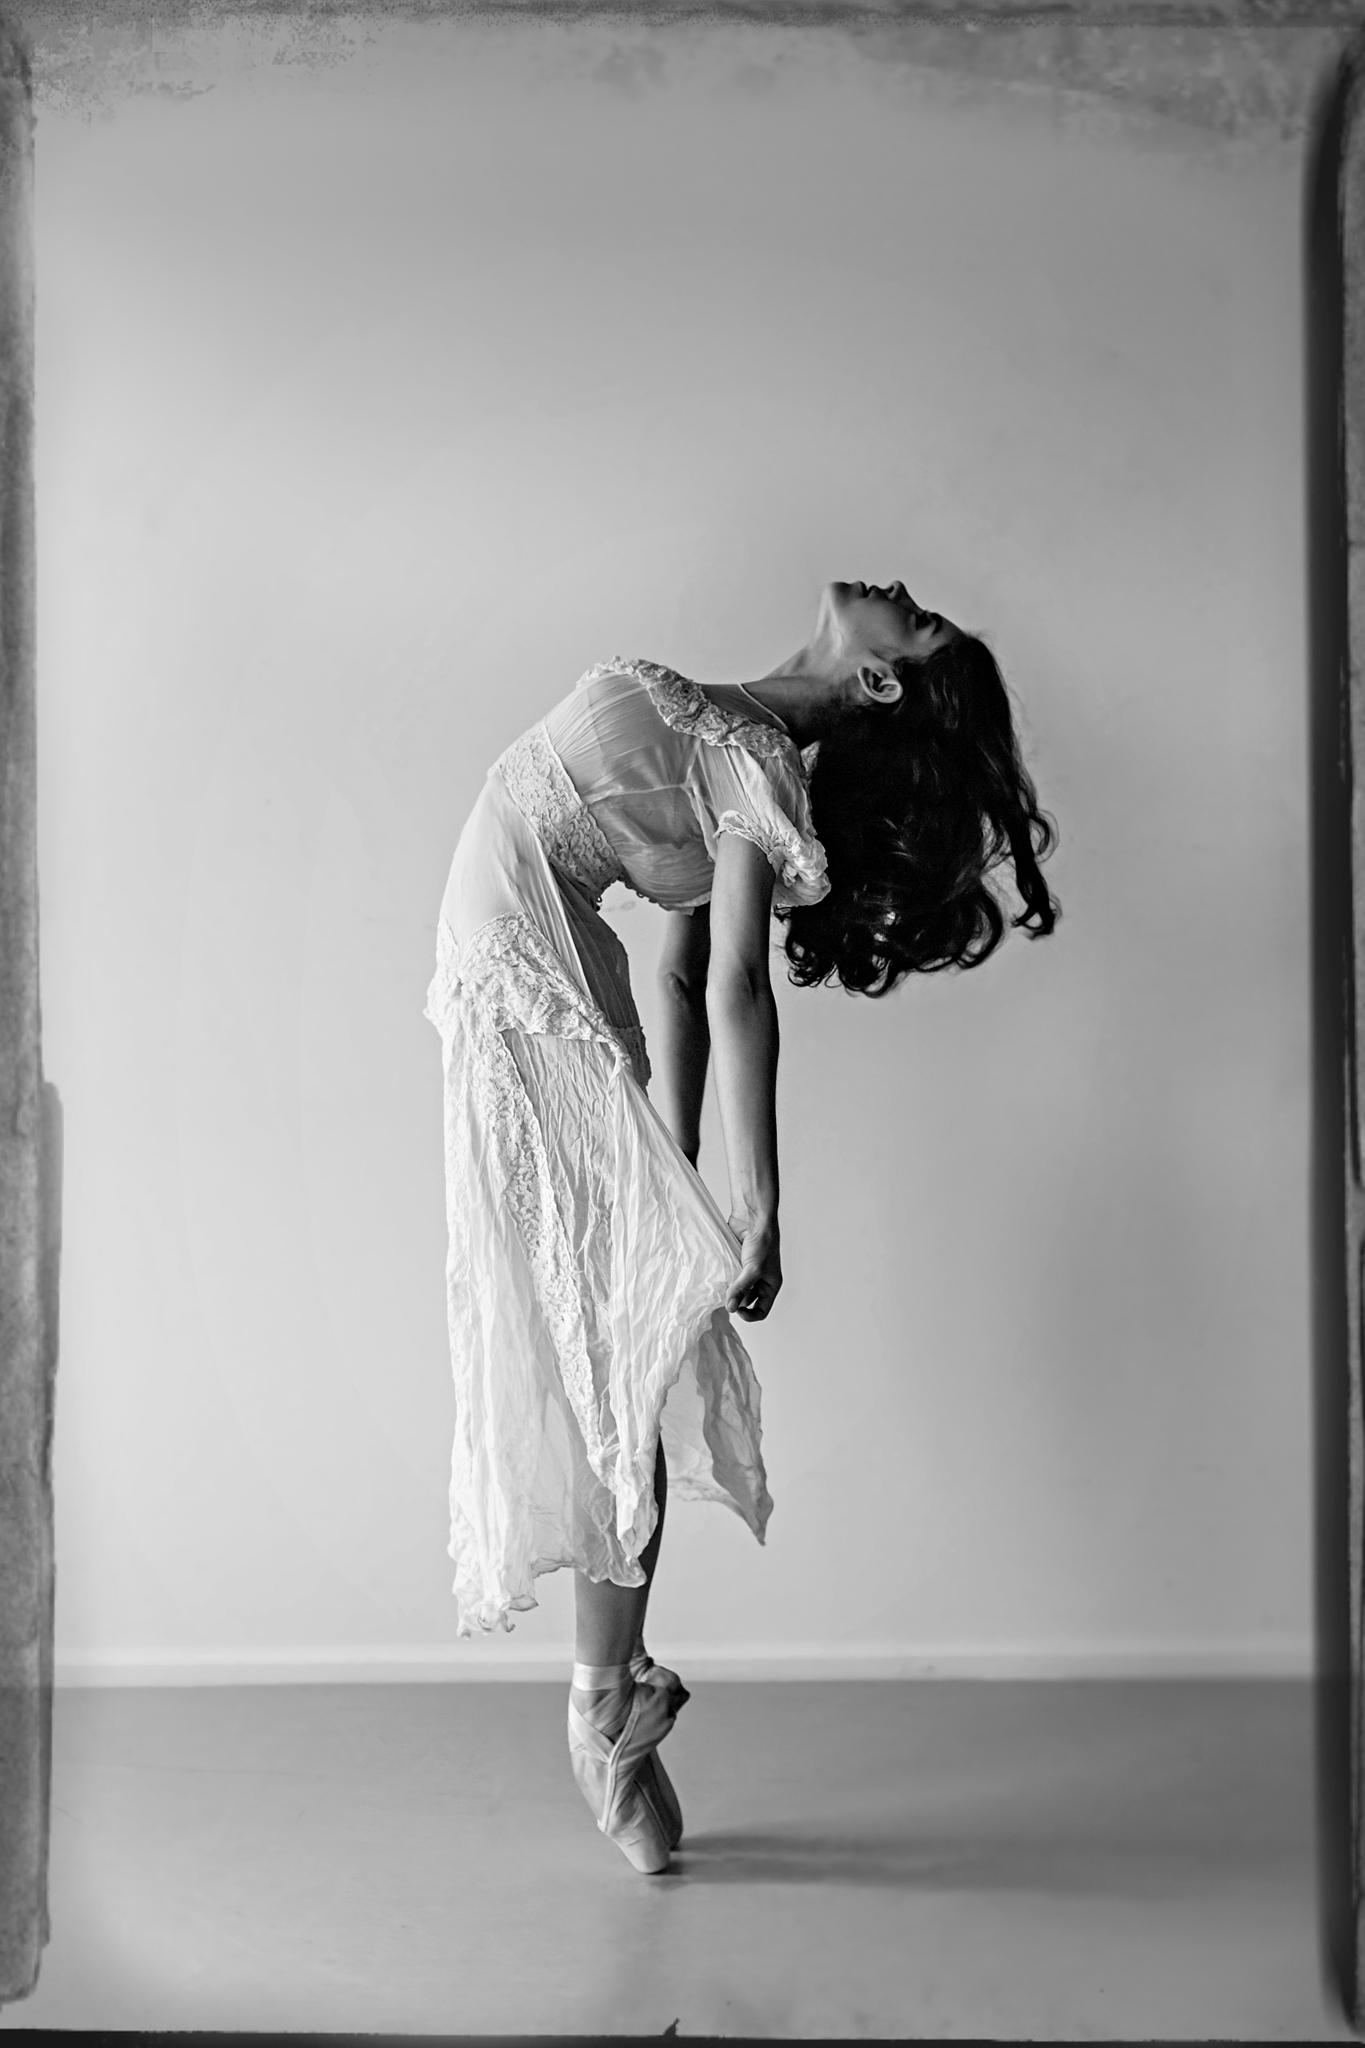 Ballerina in a vintage dress